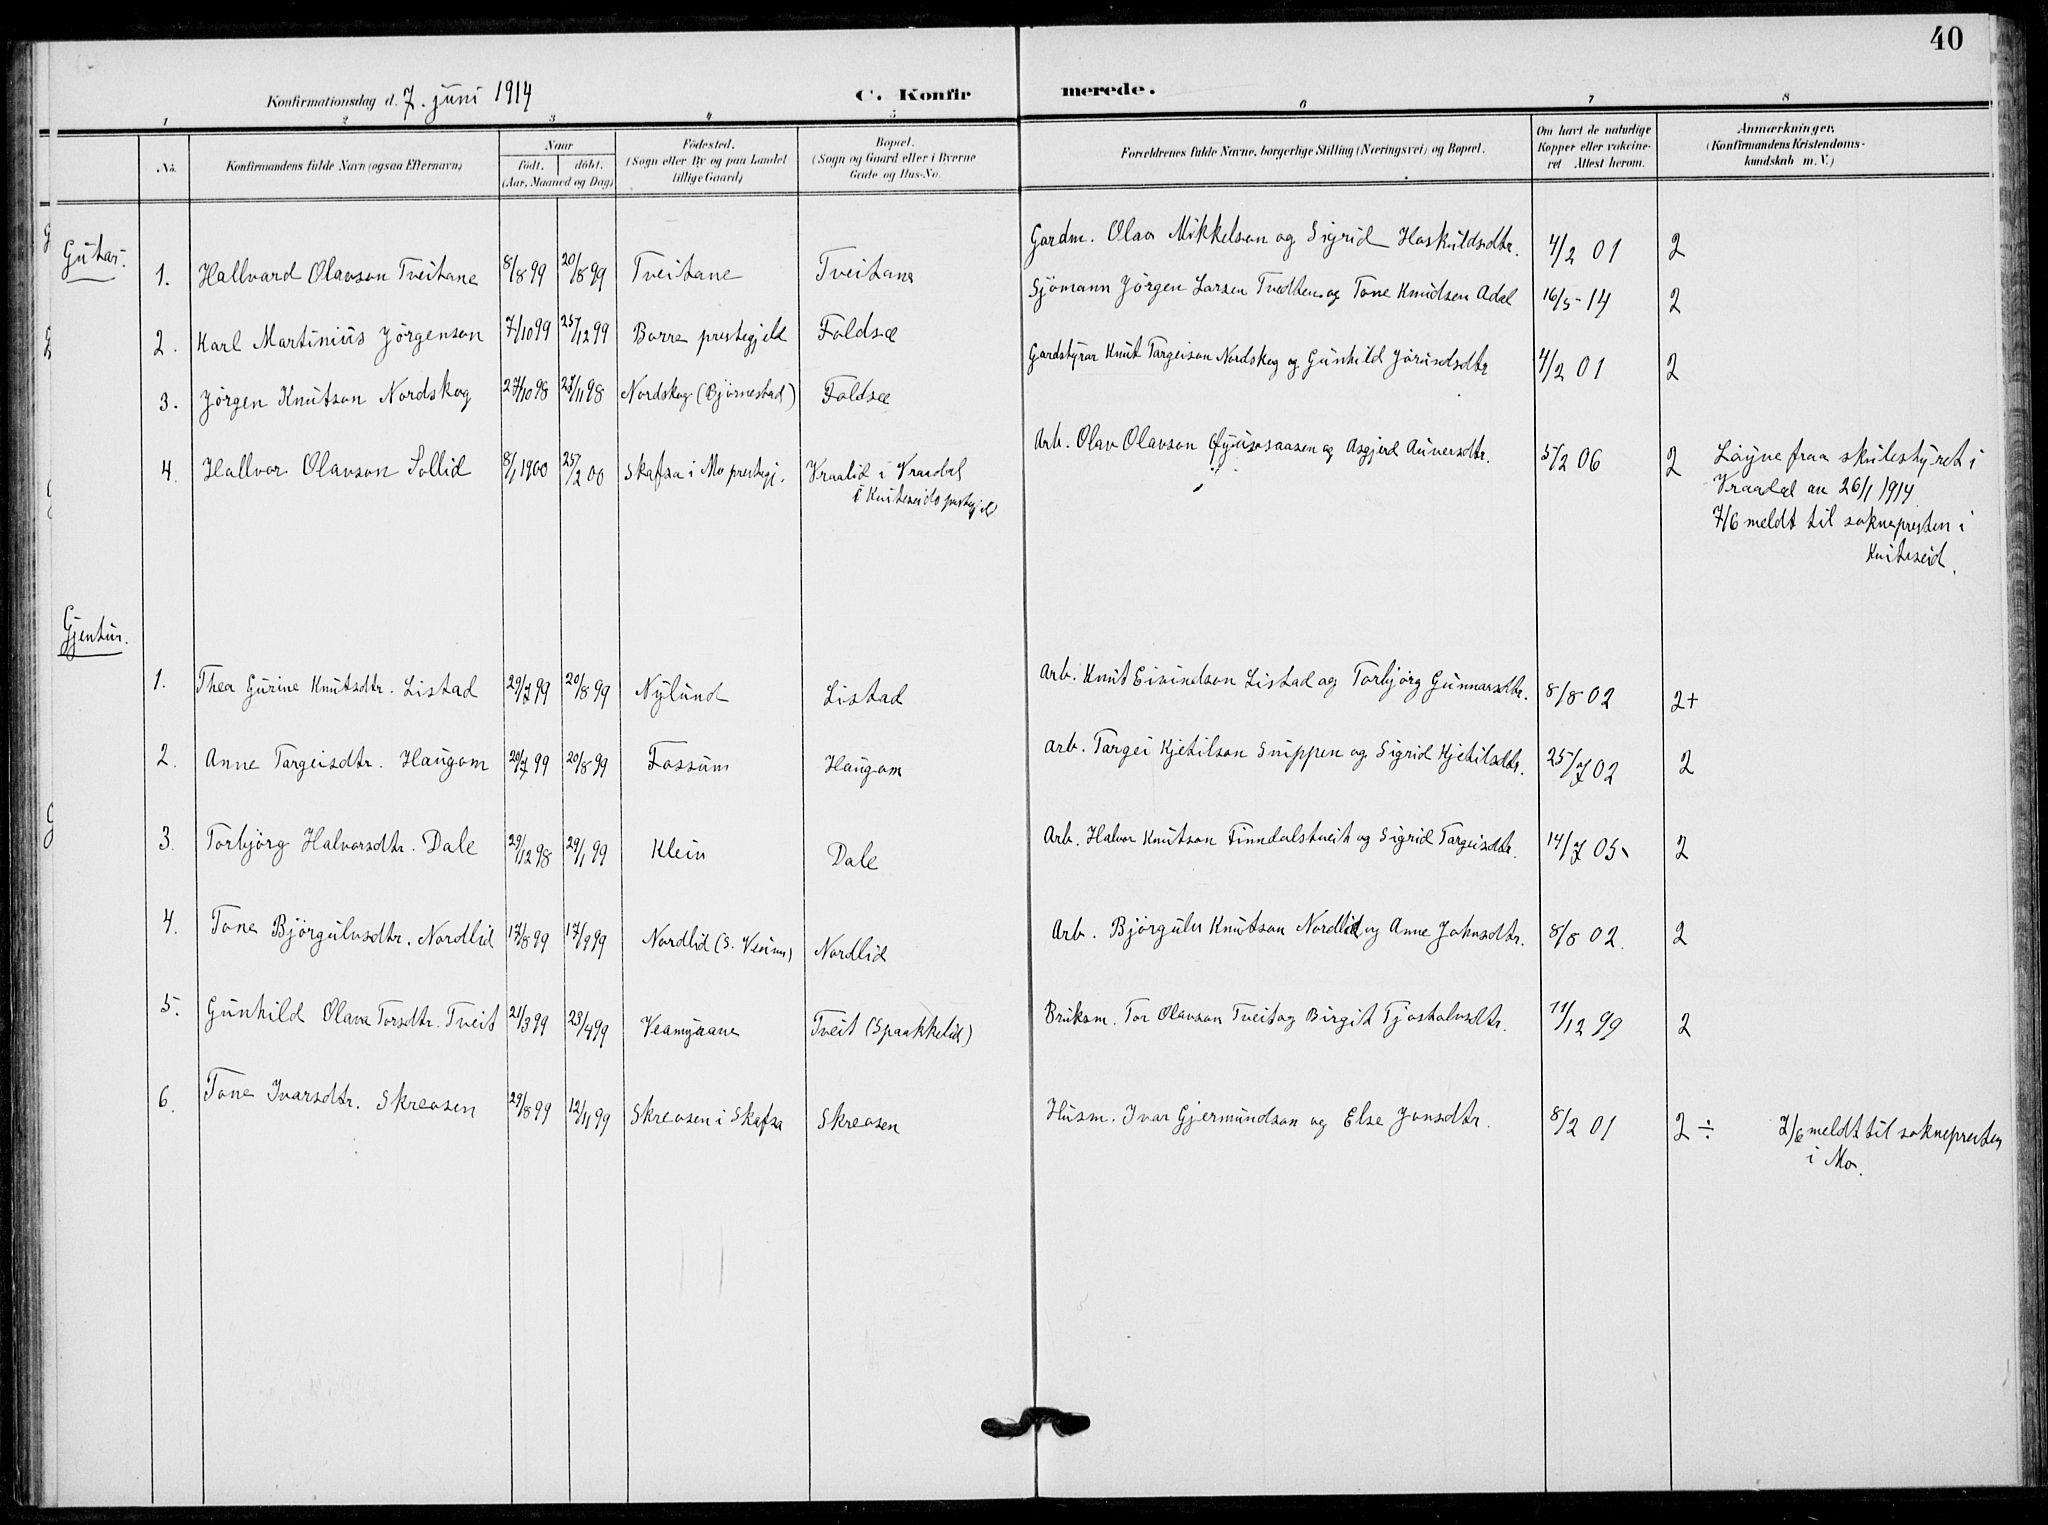 SAKO, Fyresdal kirkebøker, F/Fb/L0004: Ministerialbok nr. II 4, 1903-1920, s. 40